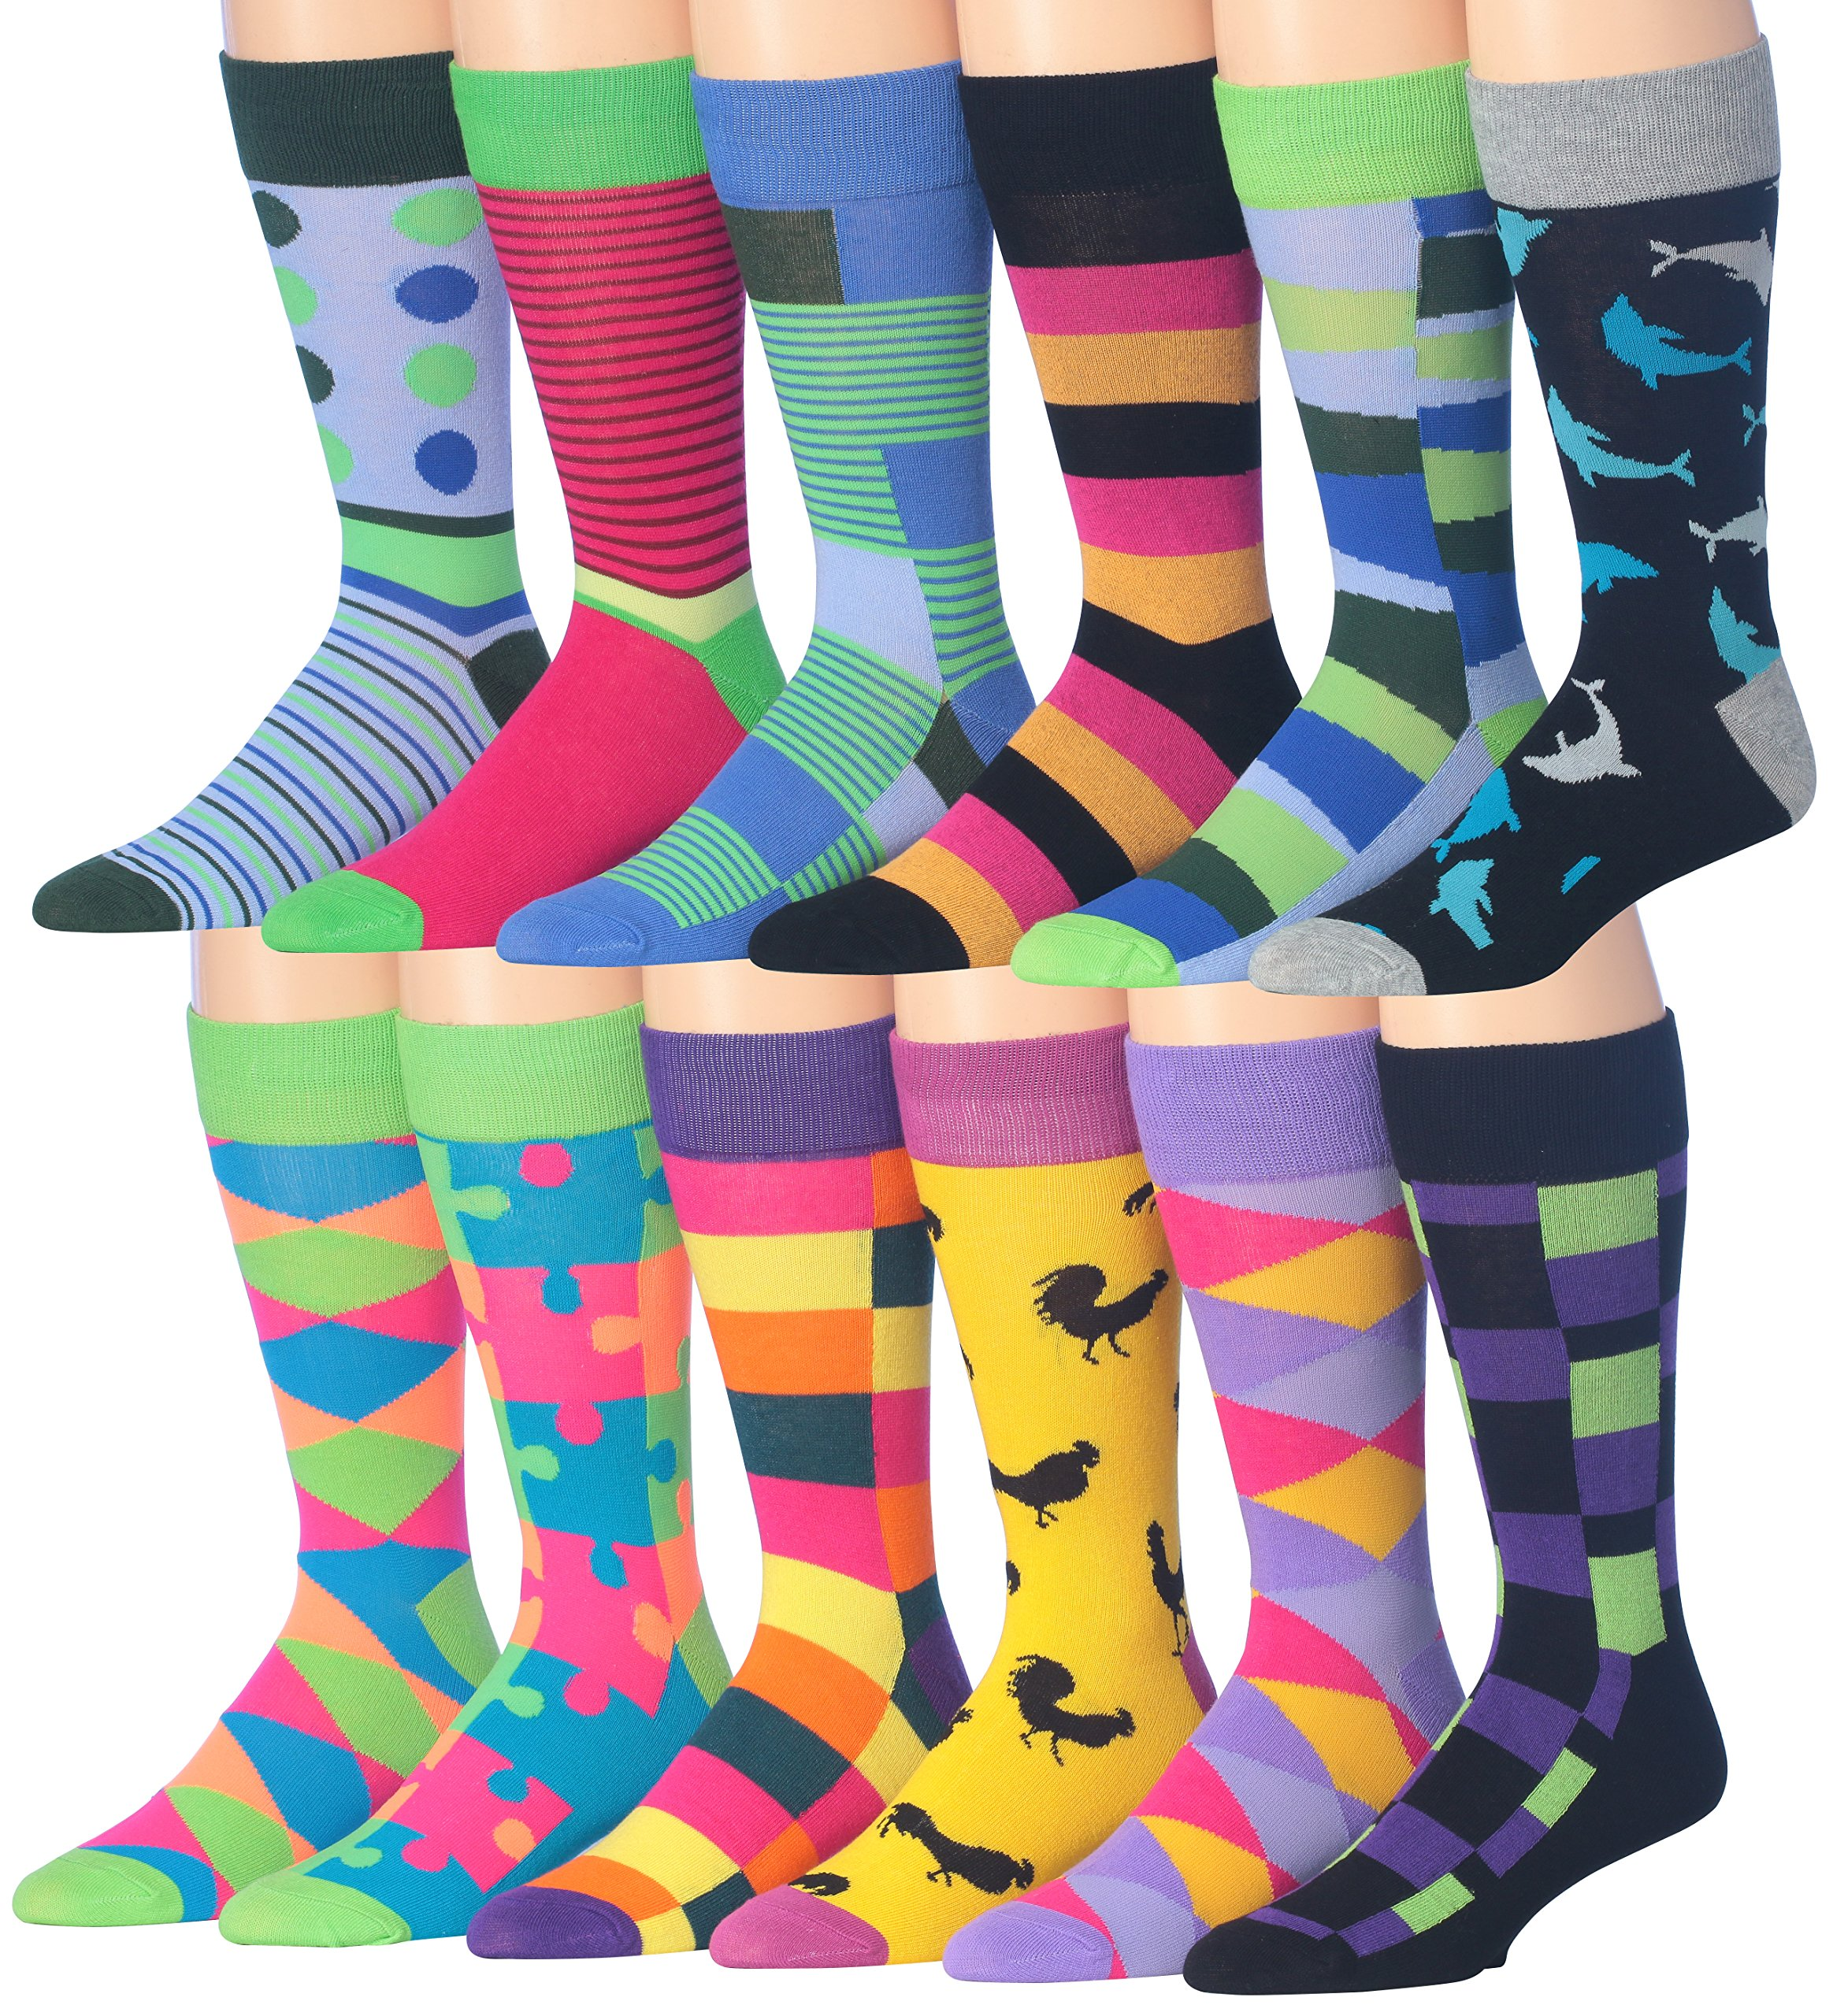 ColorfutMen's 12 Pairs Soft Cotton Colorful Funky Gift Box Dress Socks, Fits shoe 6-12 (sock size 10-13), CMC04